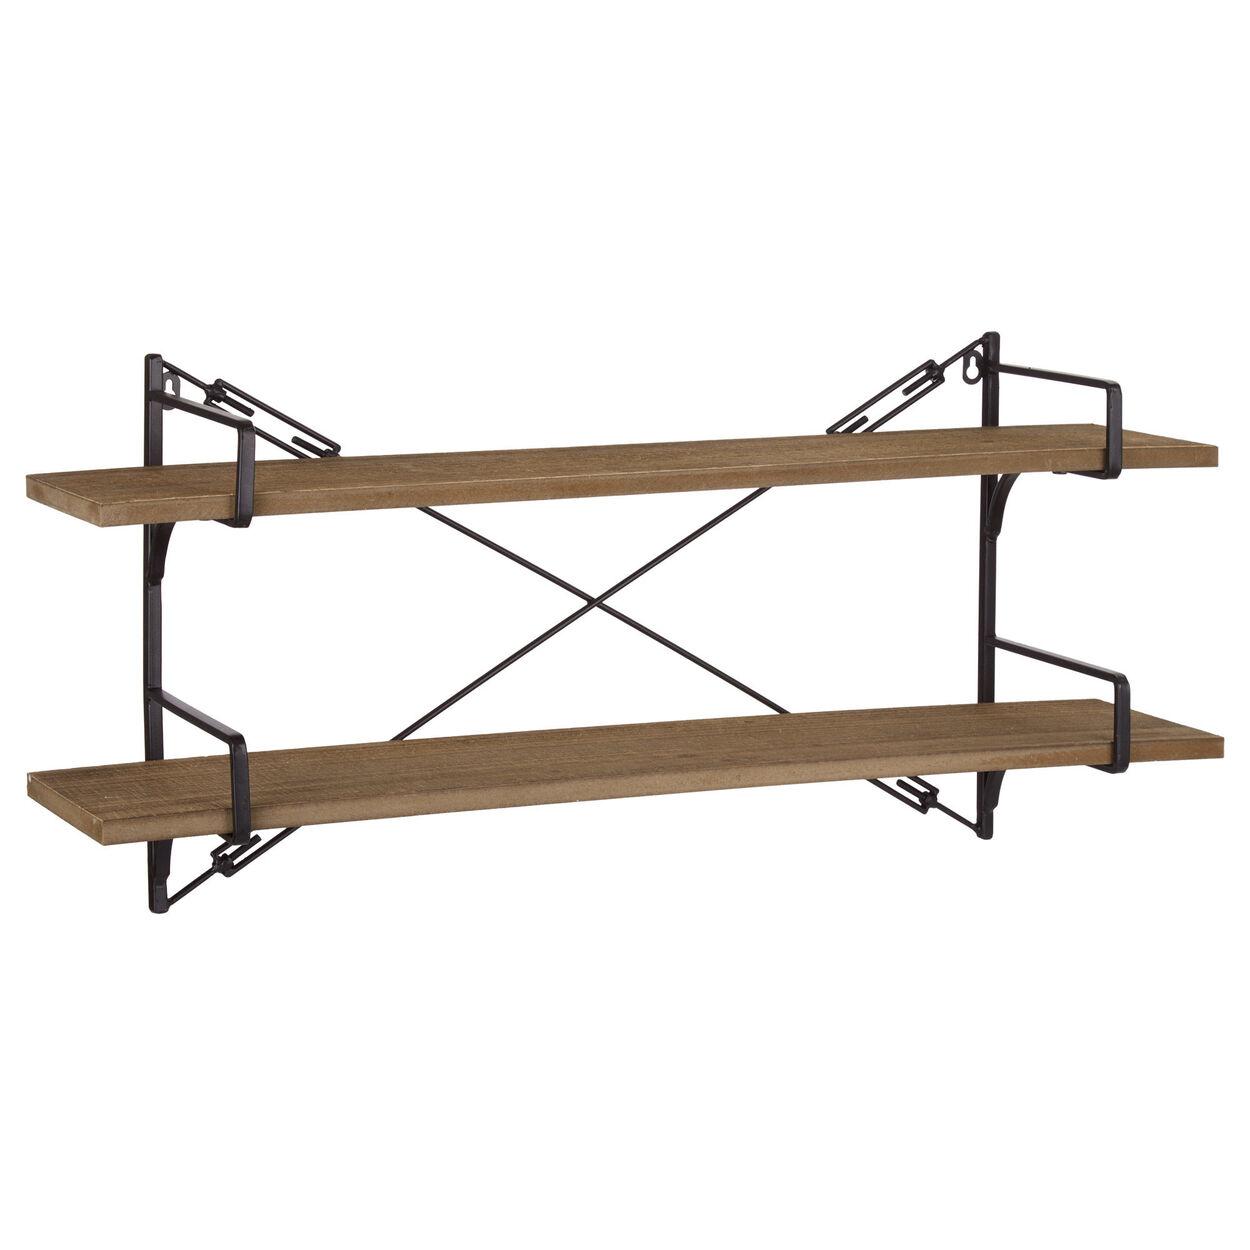 Industrial Wood and Metal Wall Shelf